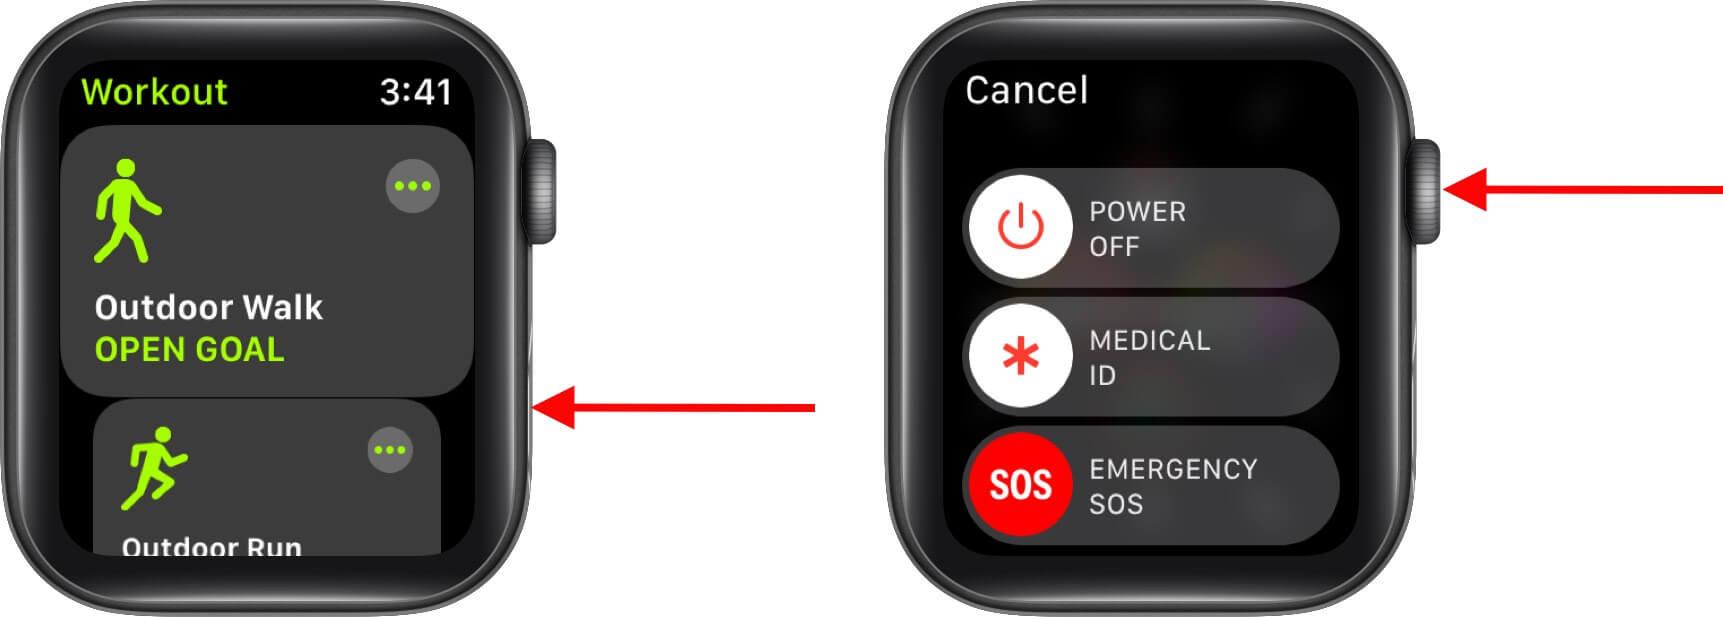 Force Close App on Apple Watch